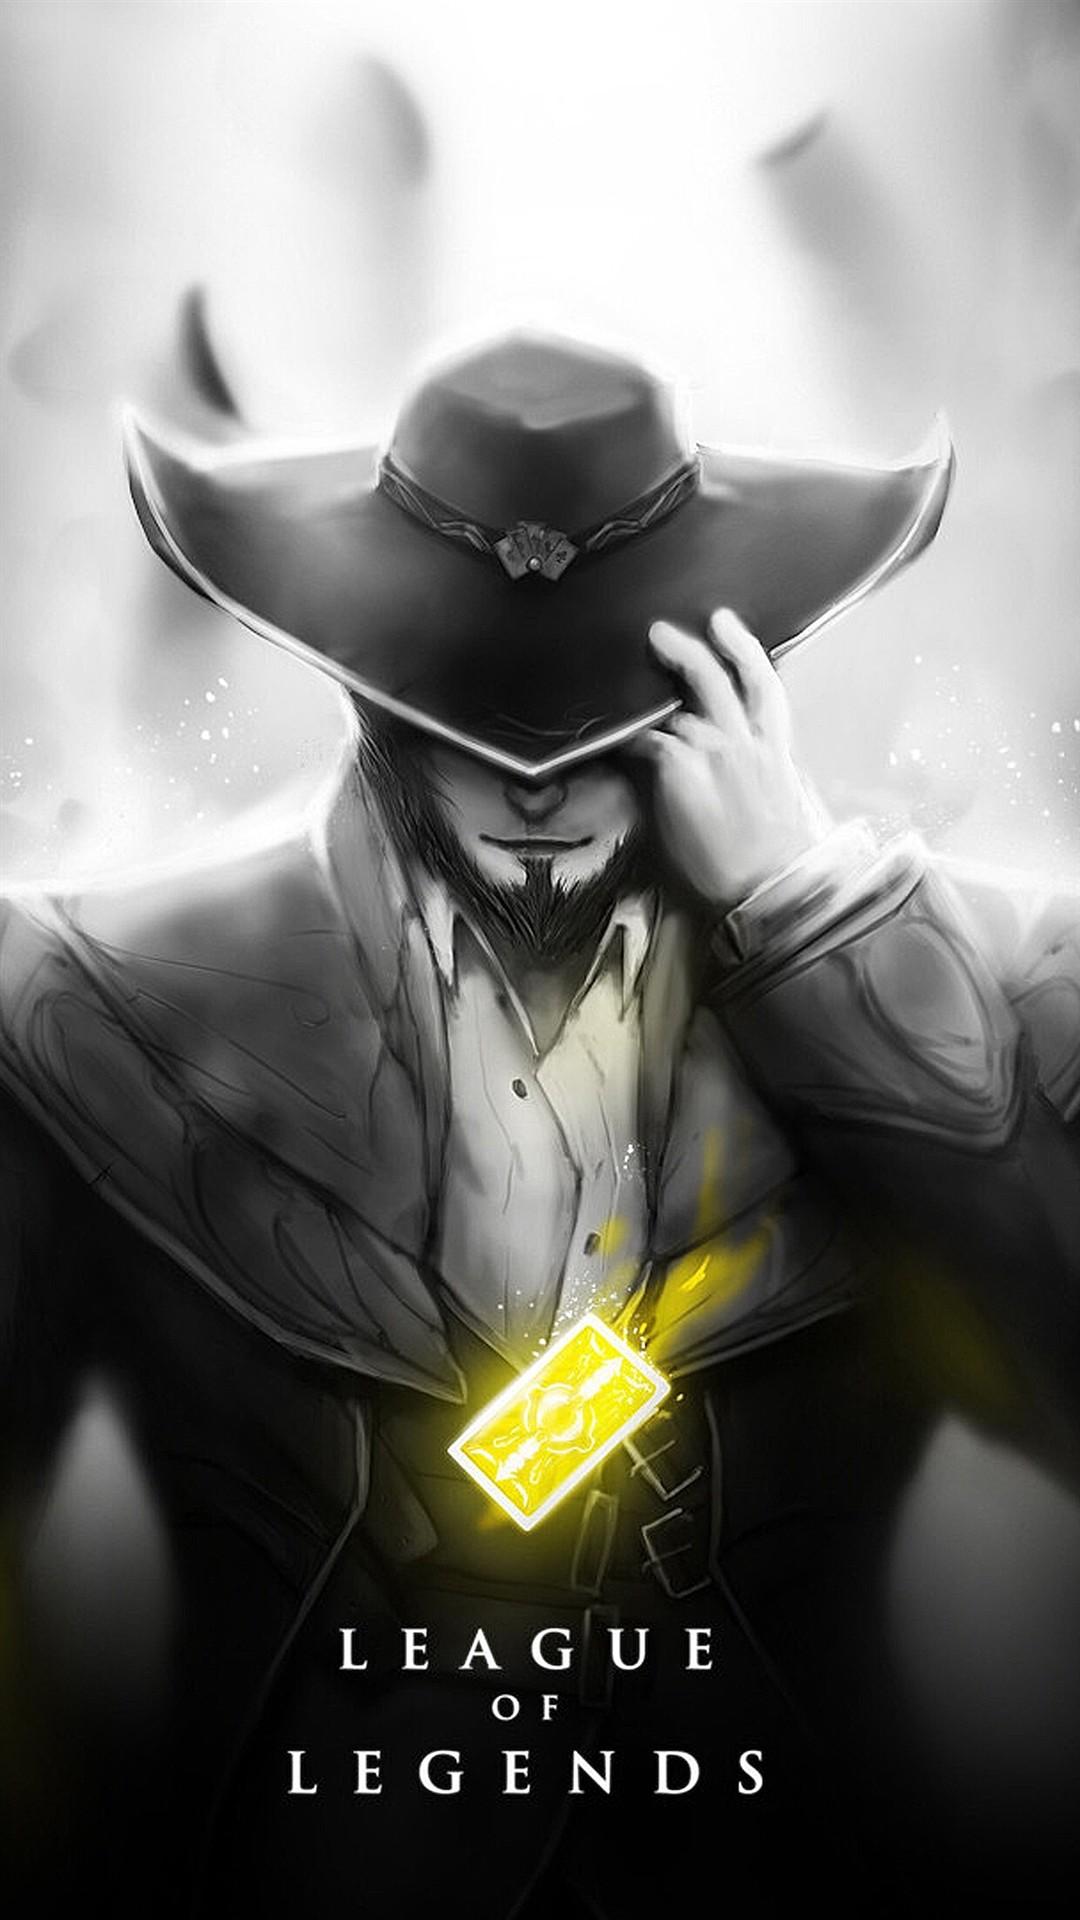 League Of Legends Poster #iPhone #6 #plus #wallpaper